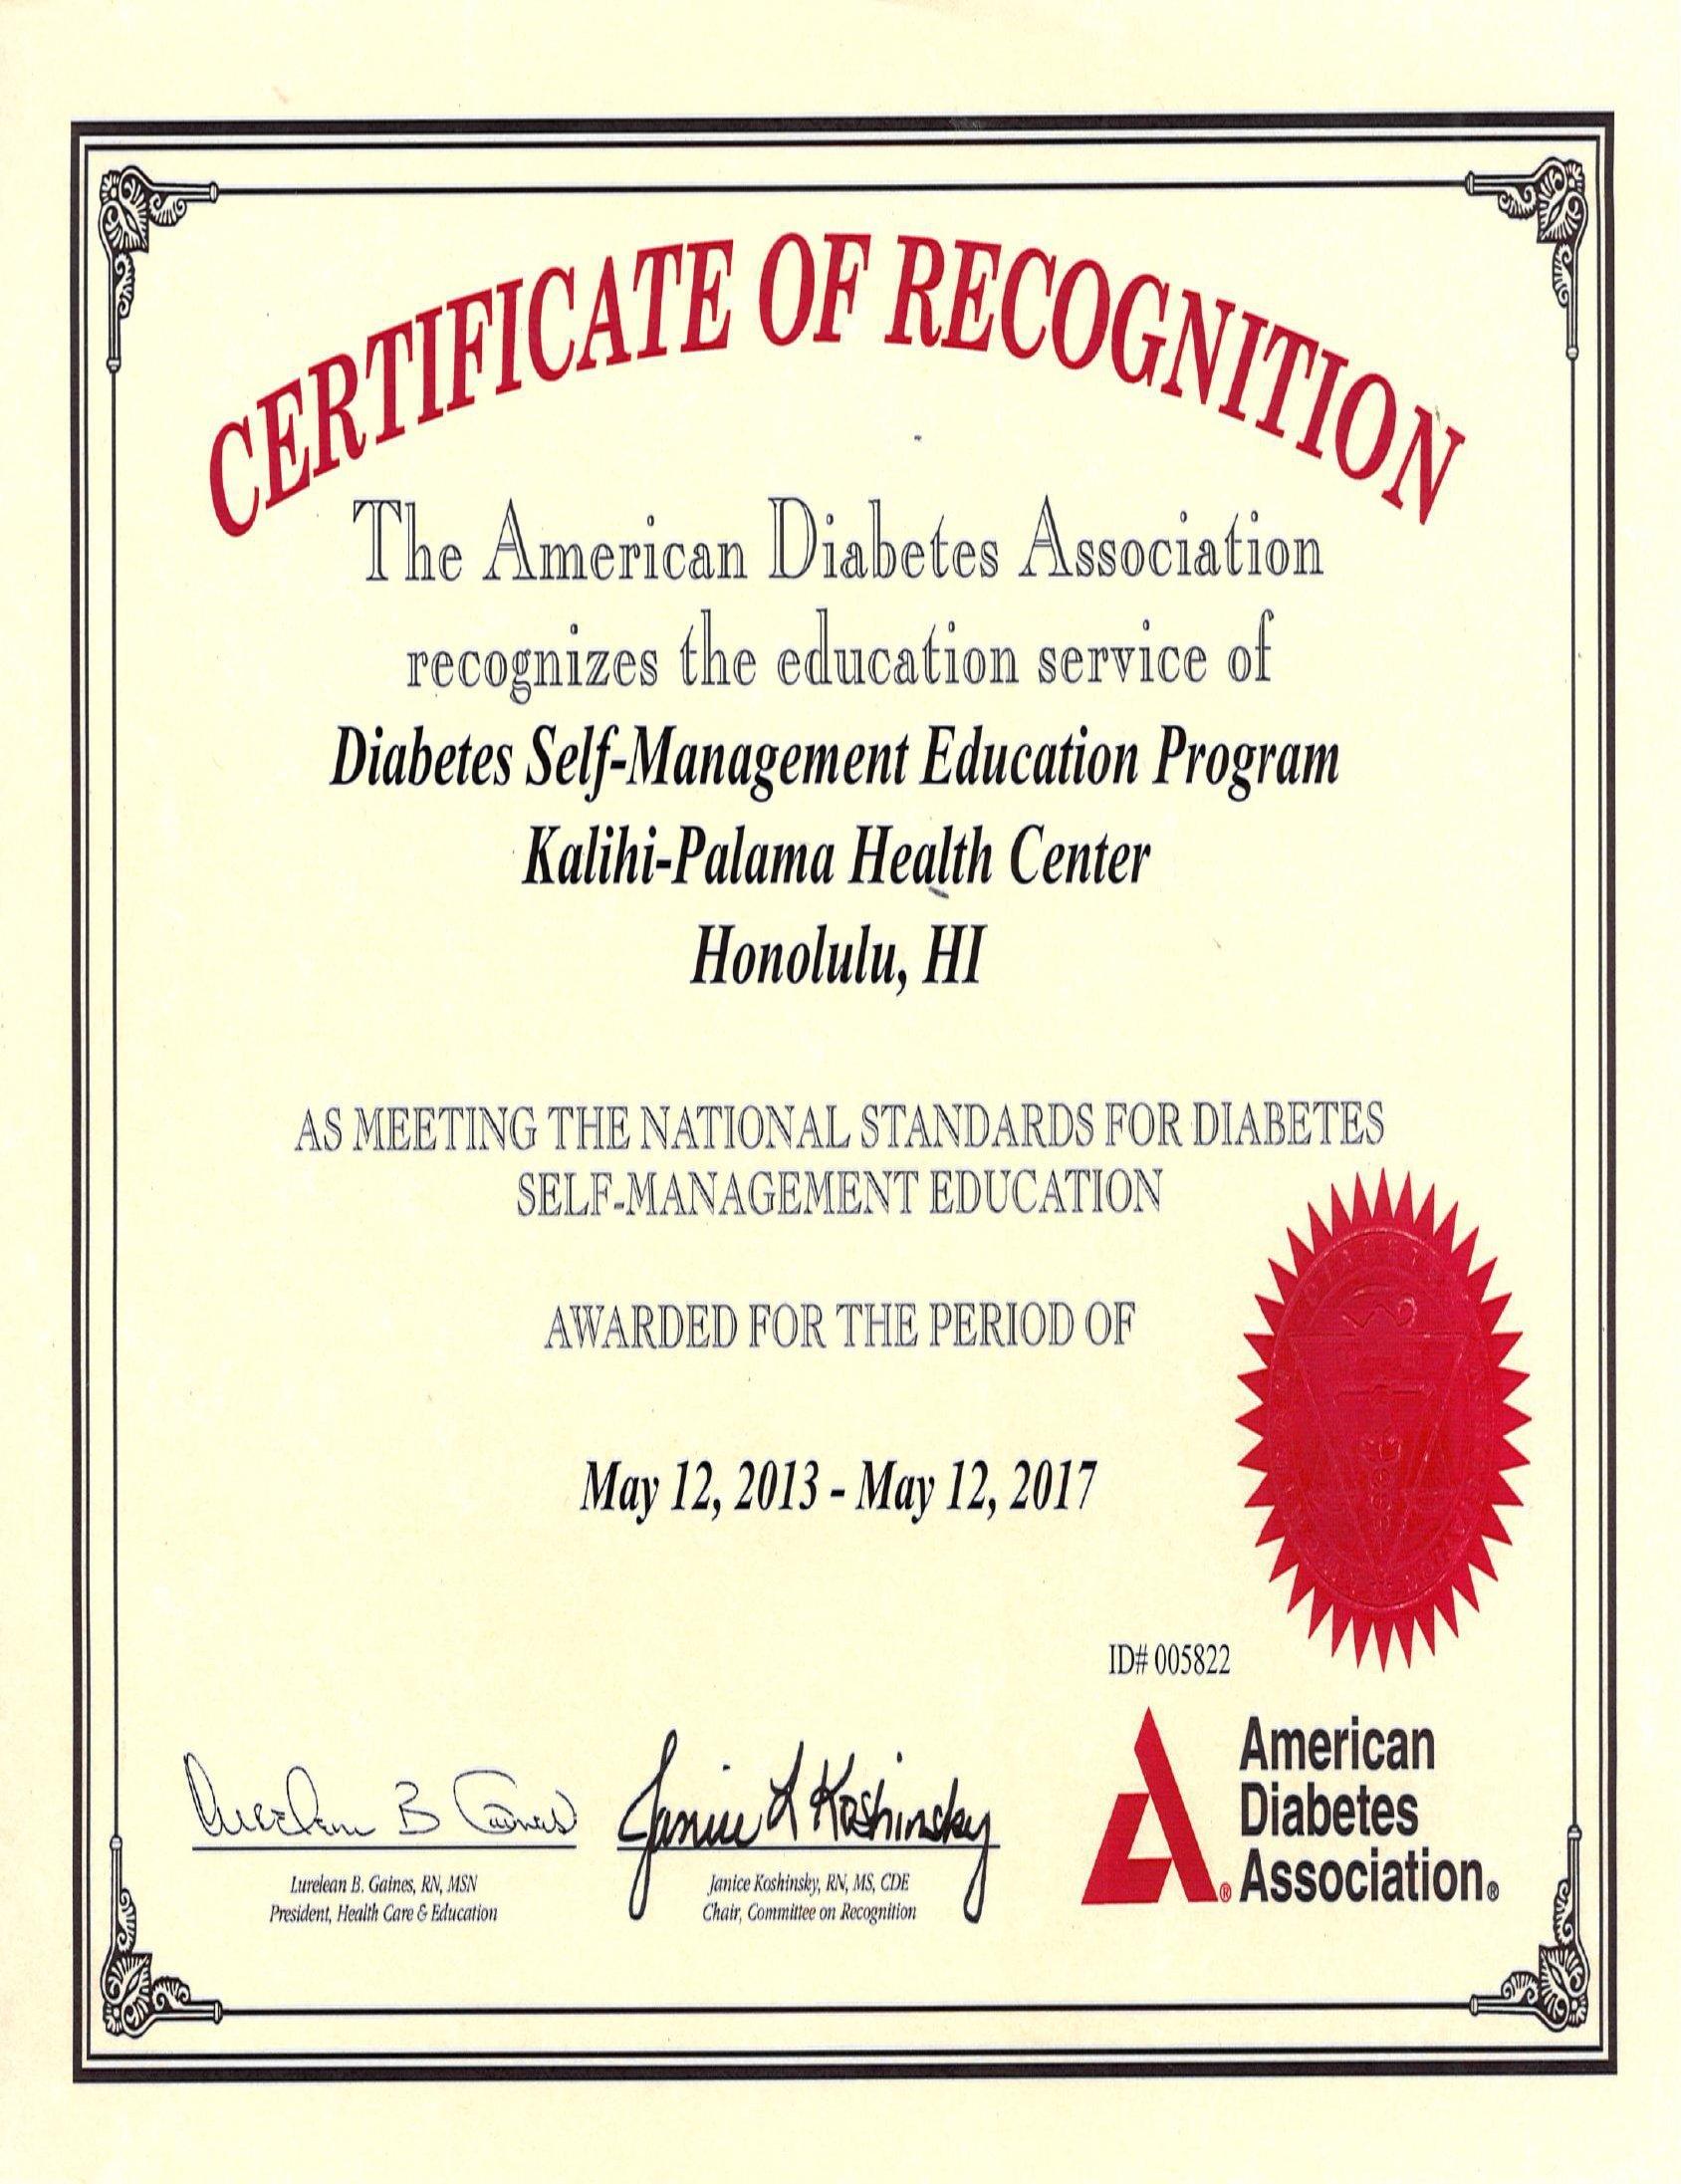 Recognitions Kalihi Palama Health Center